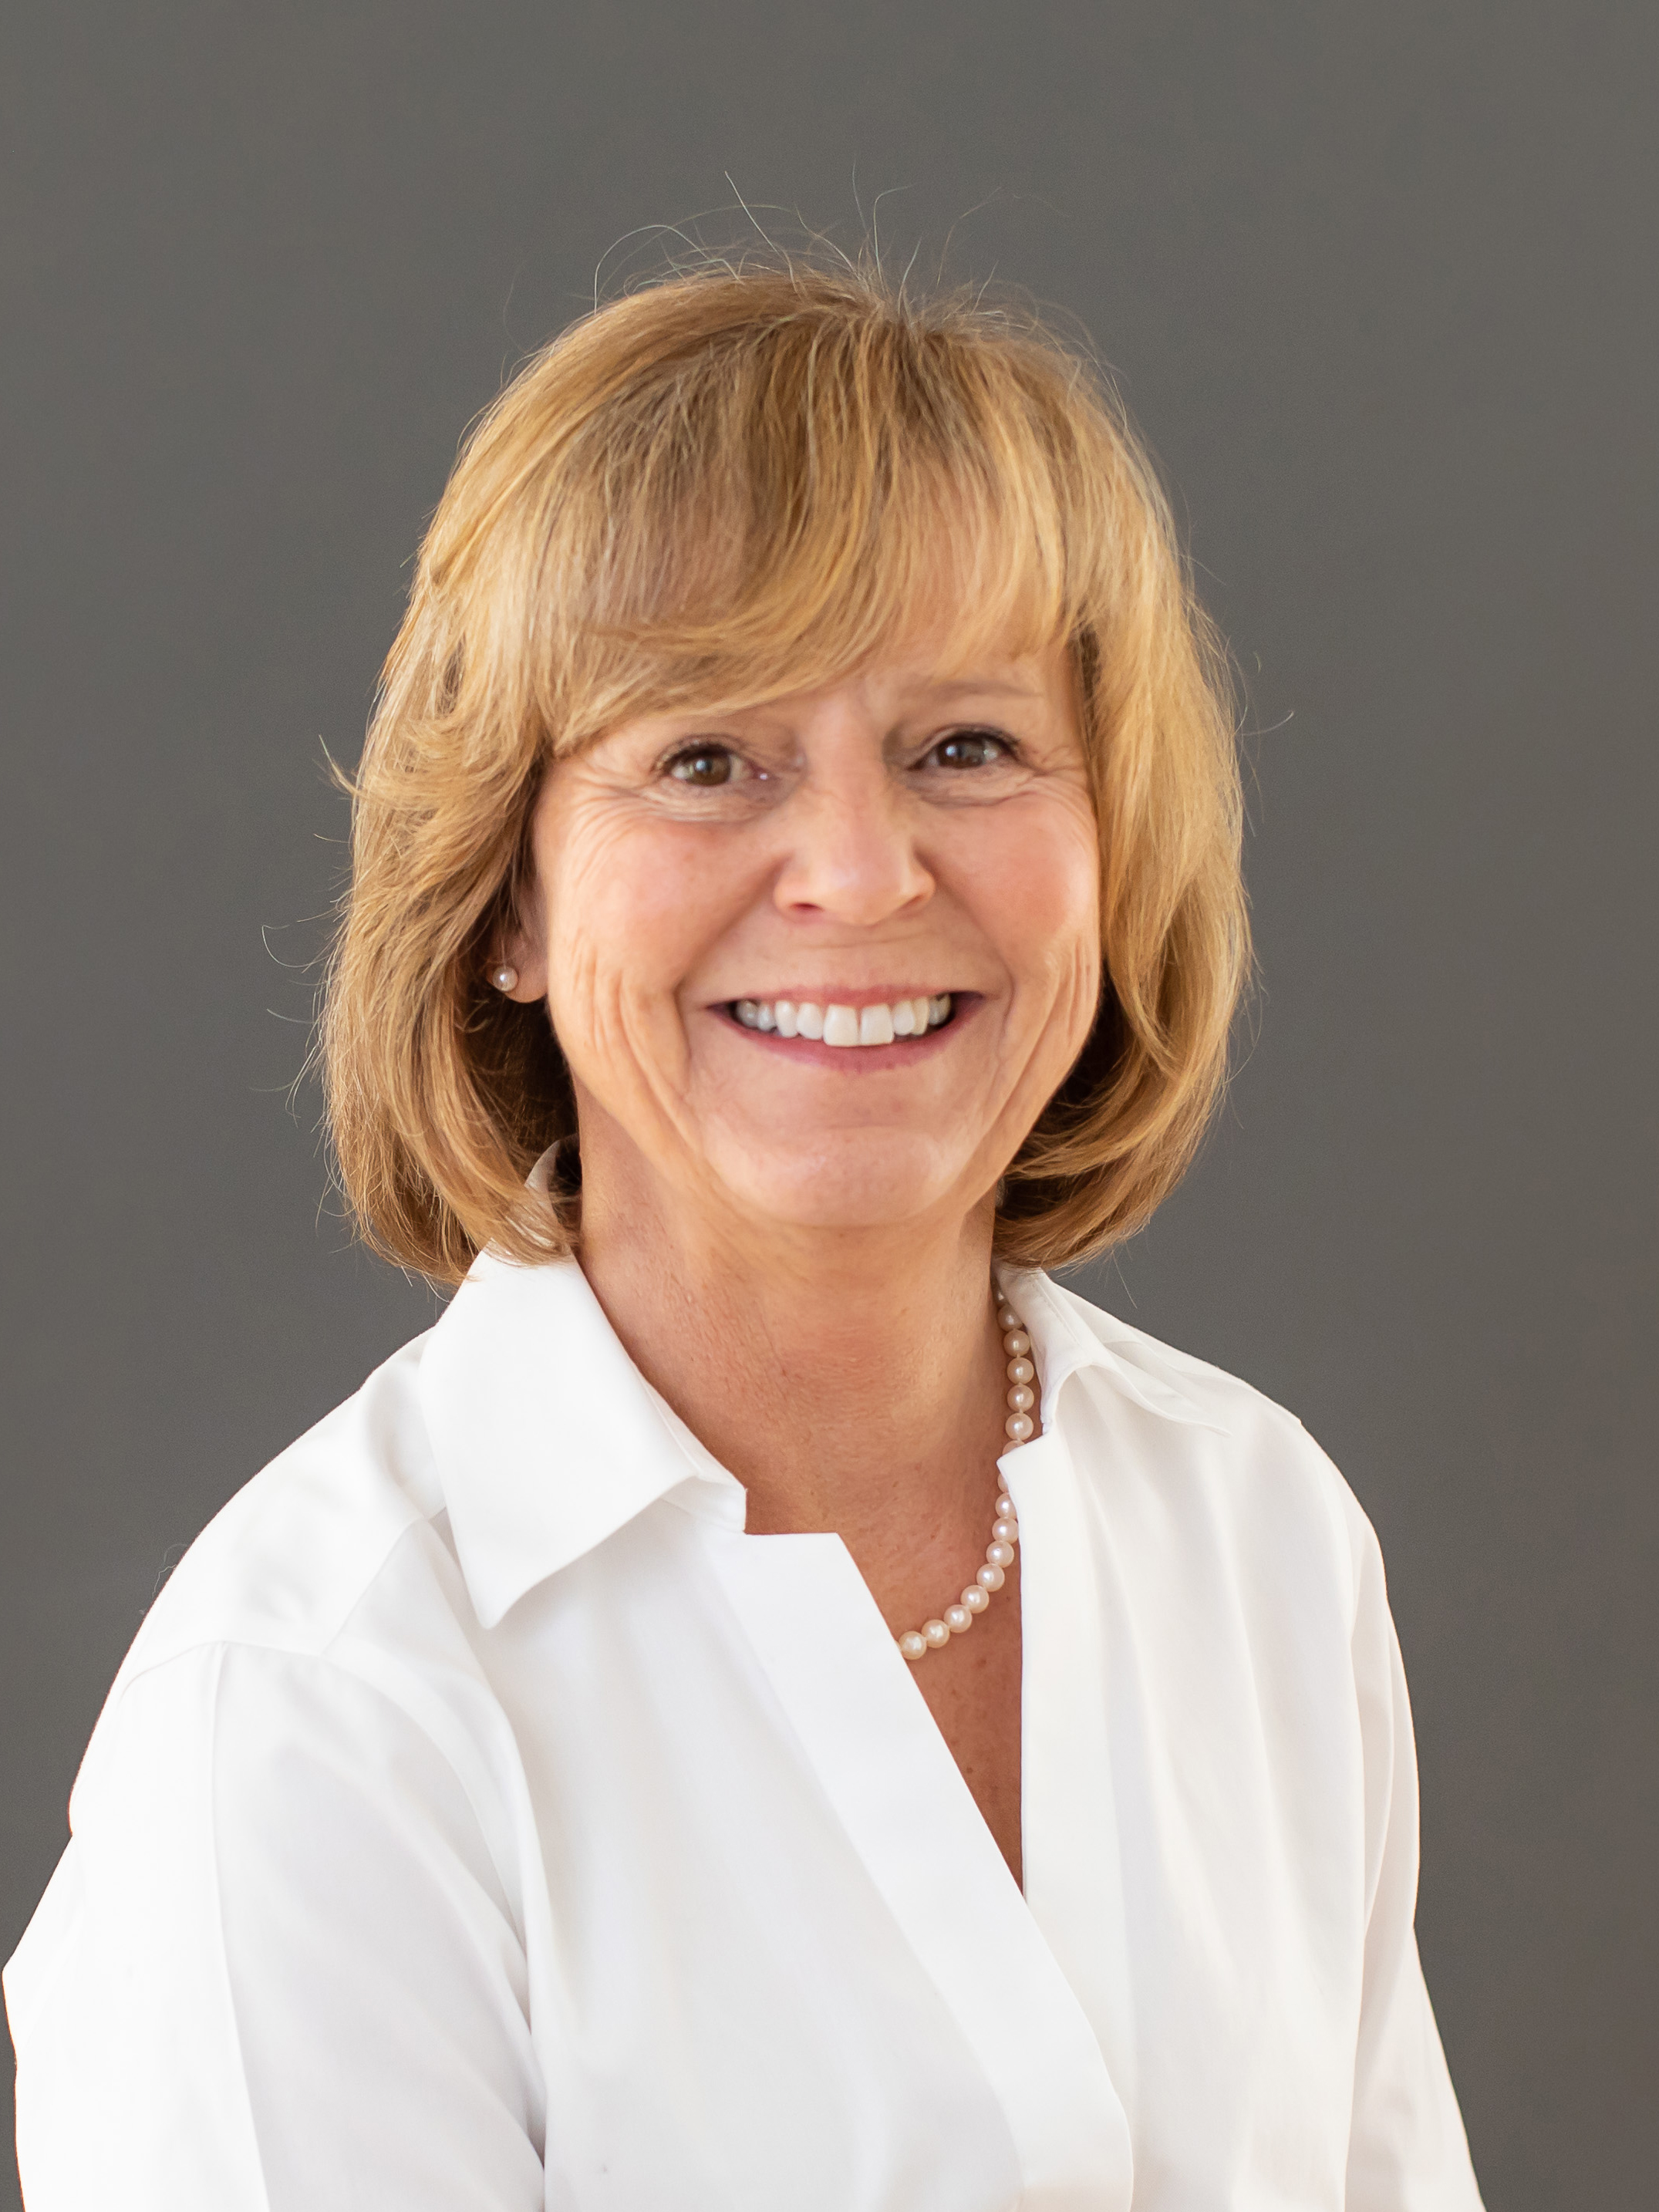 Janet Whitworth